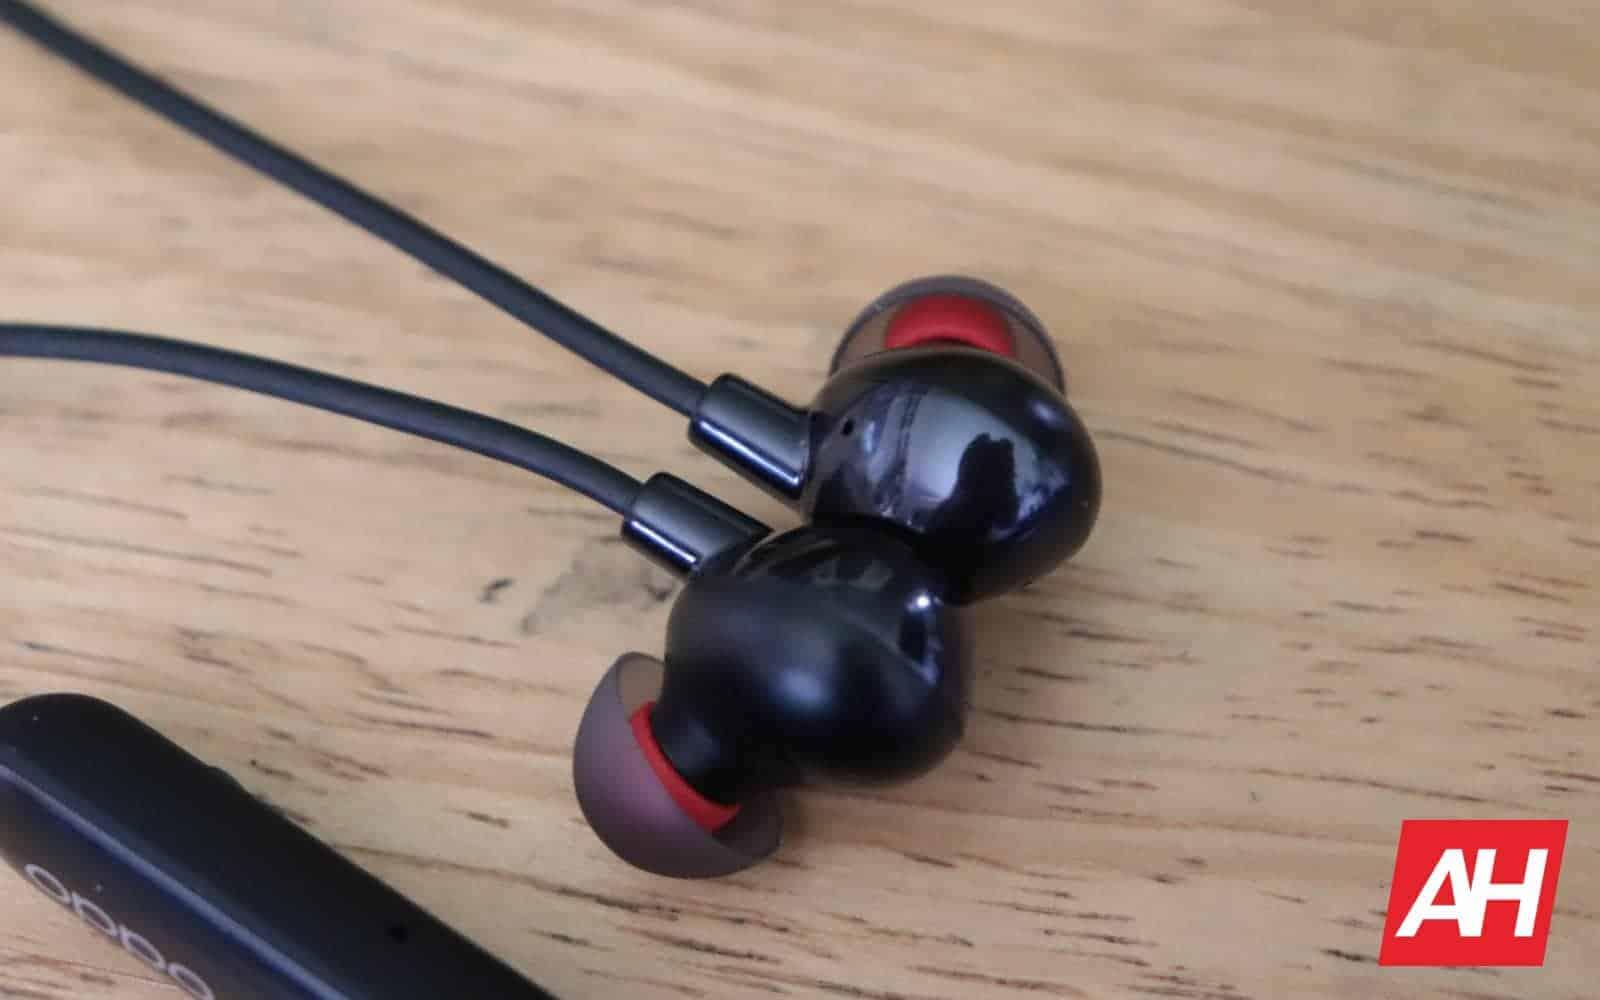 05 6 OPPO Enco Q1 Headphones Hardware AH 2019